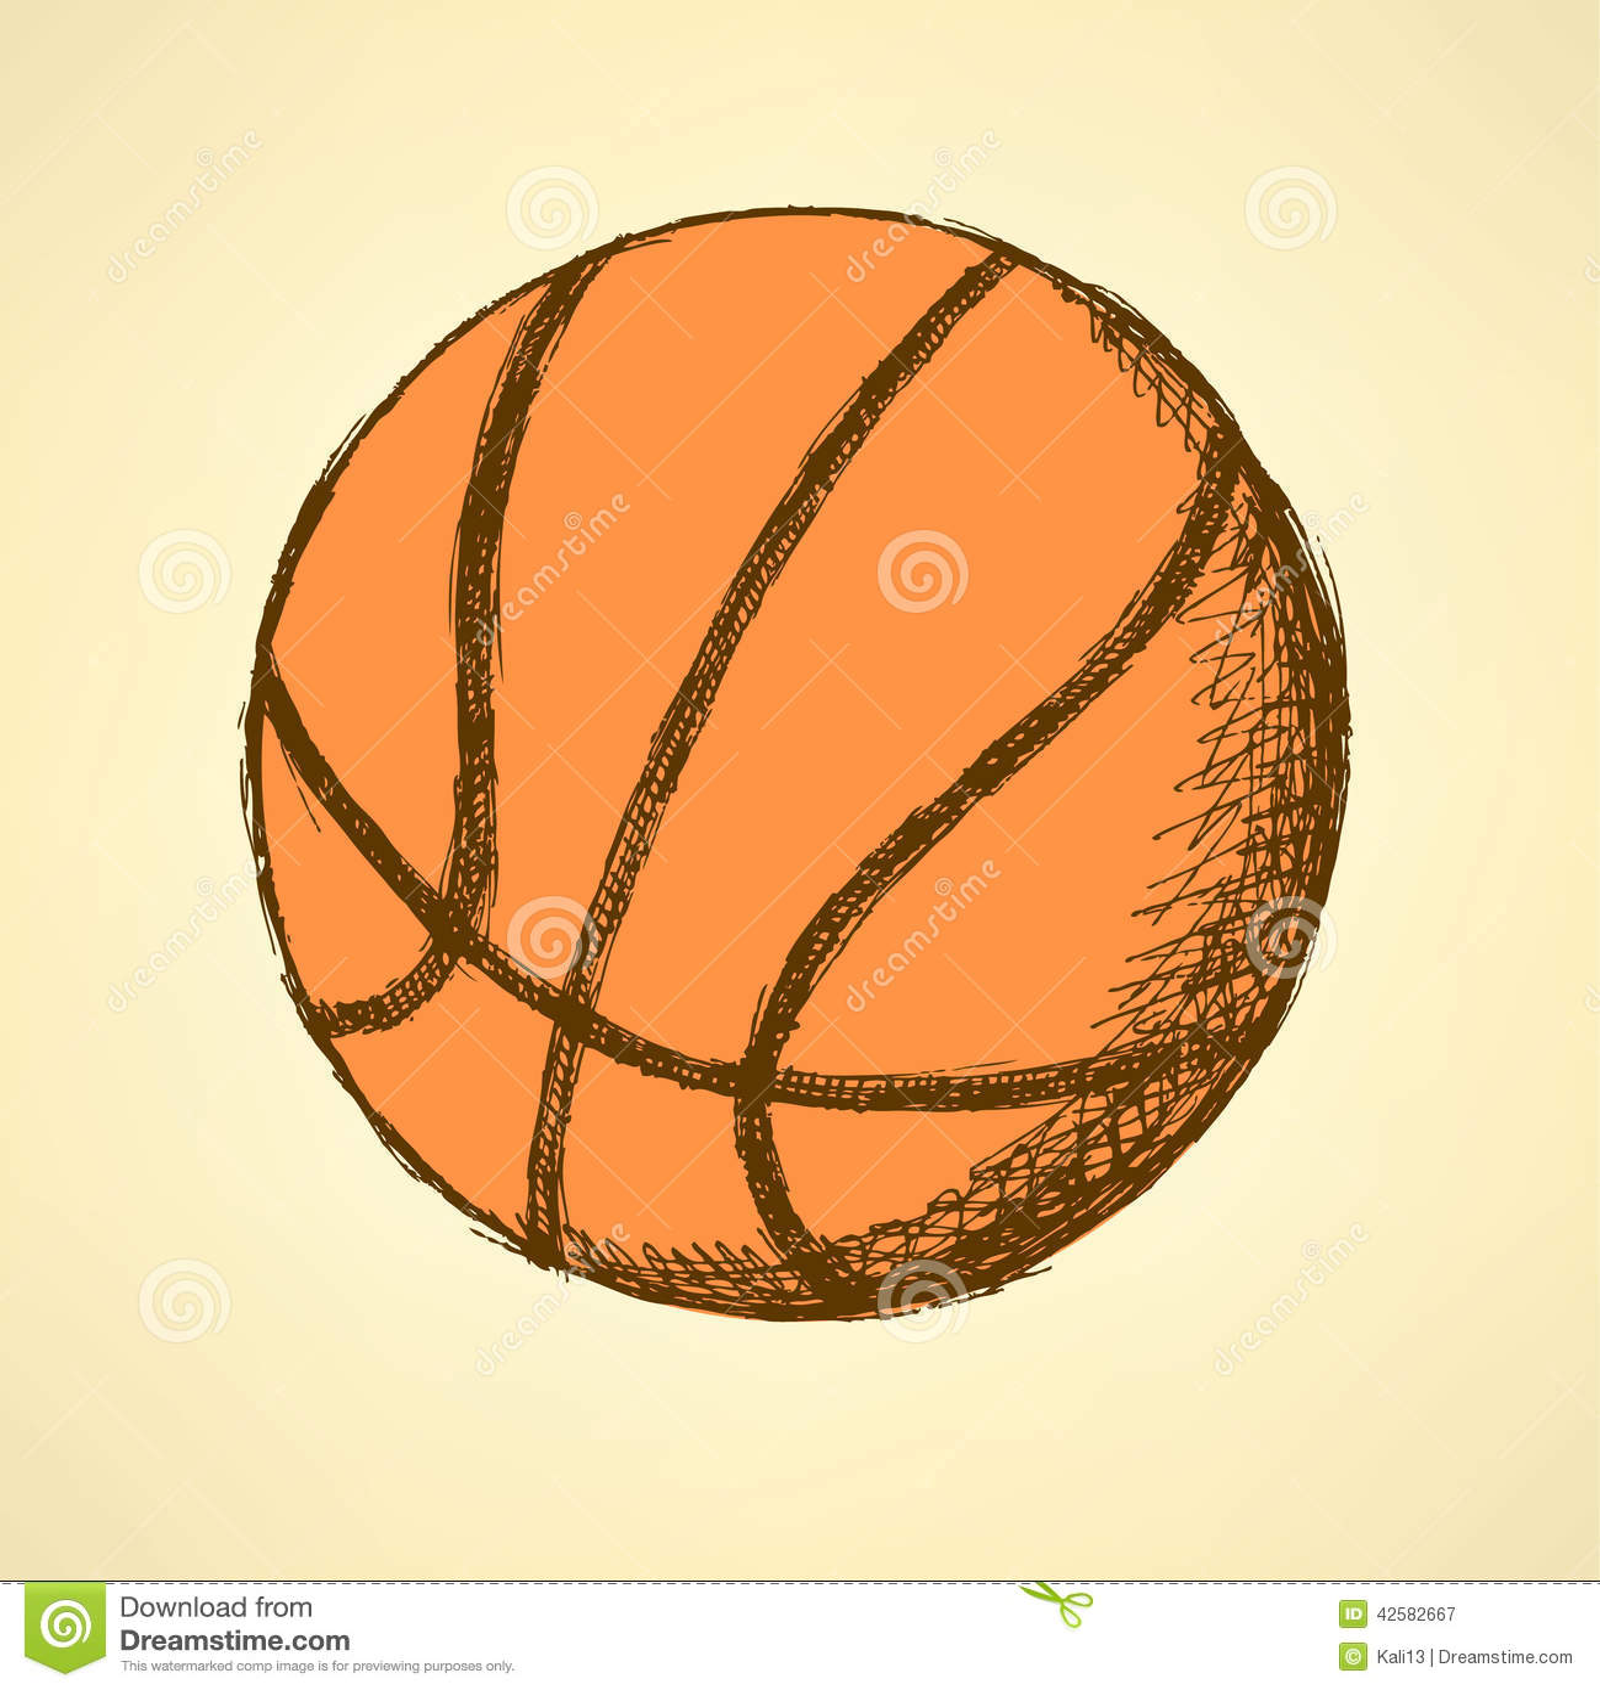 basketball color sketch stock photos image 14883653